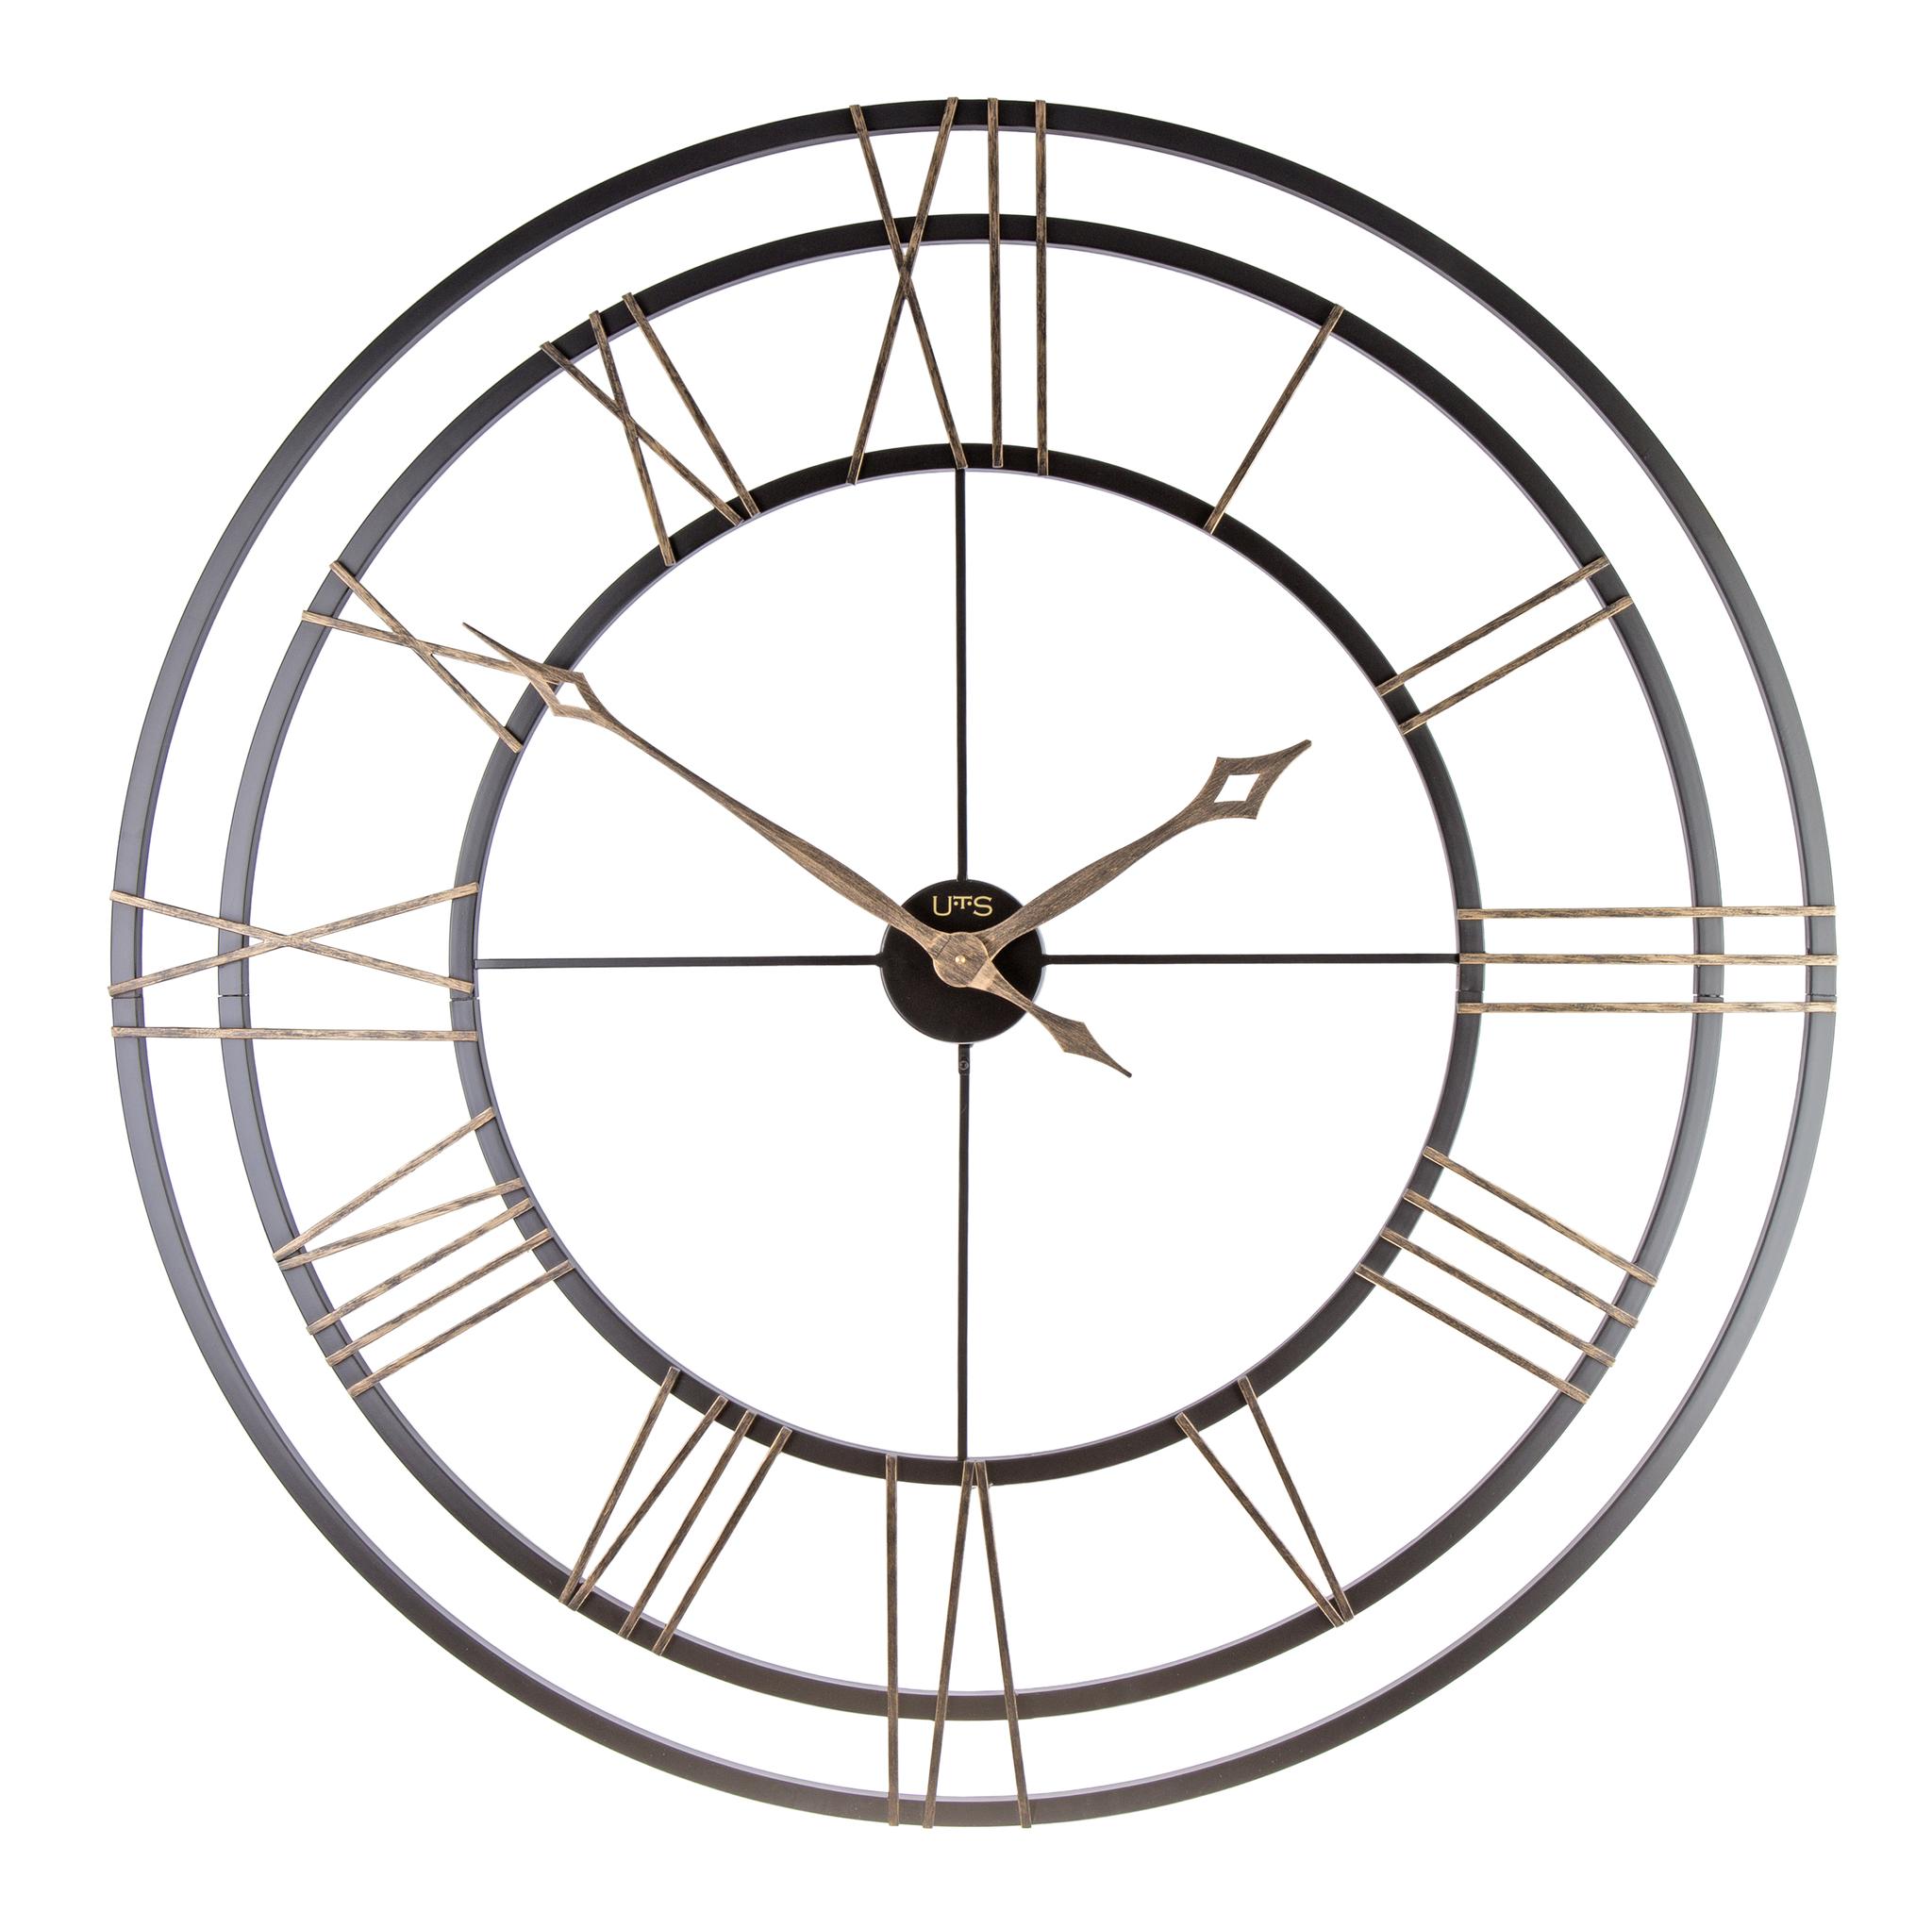 Часы настенные Часы настенные Tomas Stern 9023 chasy-nastennye-tomas-stern-9023-germaniya.jpg